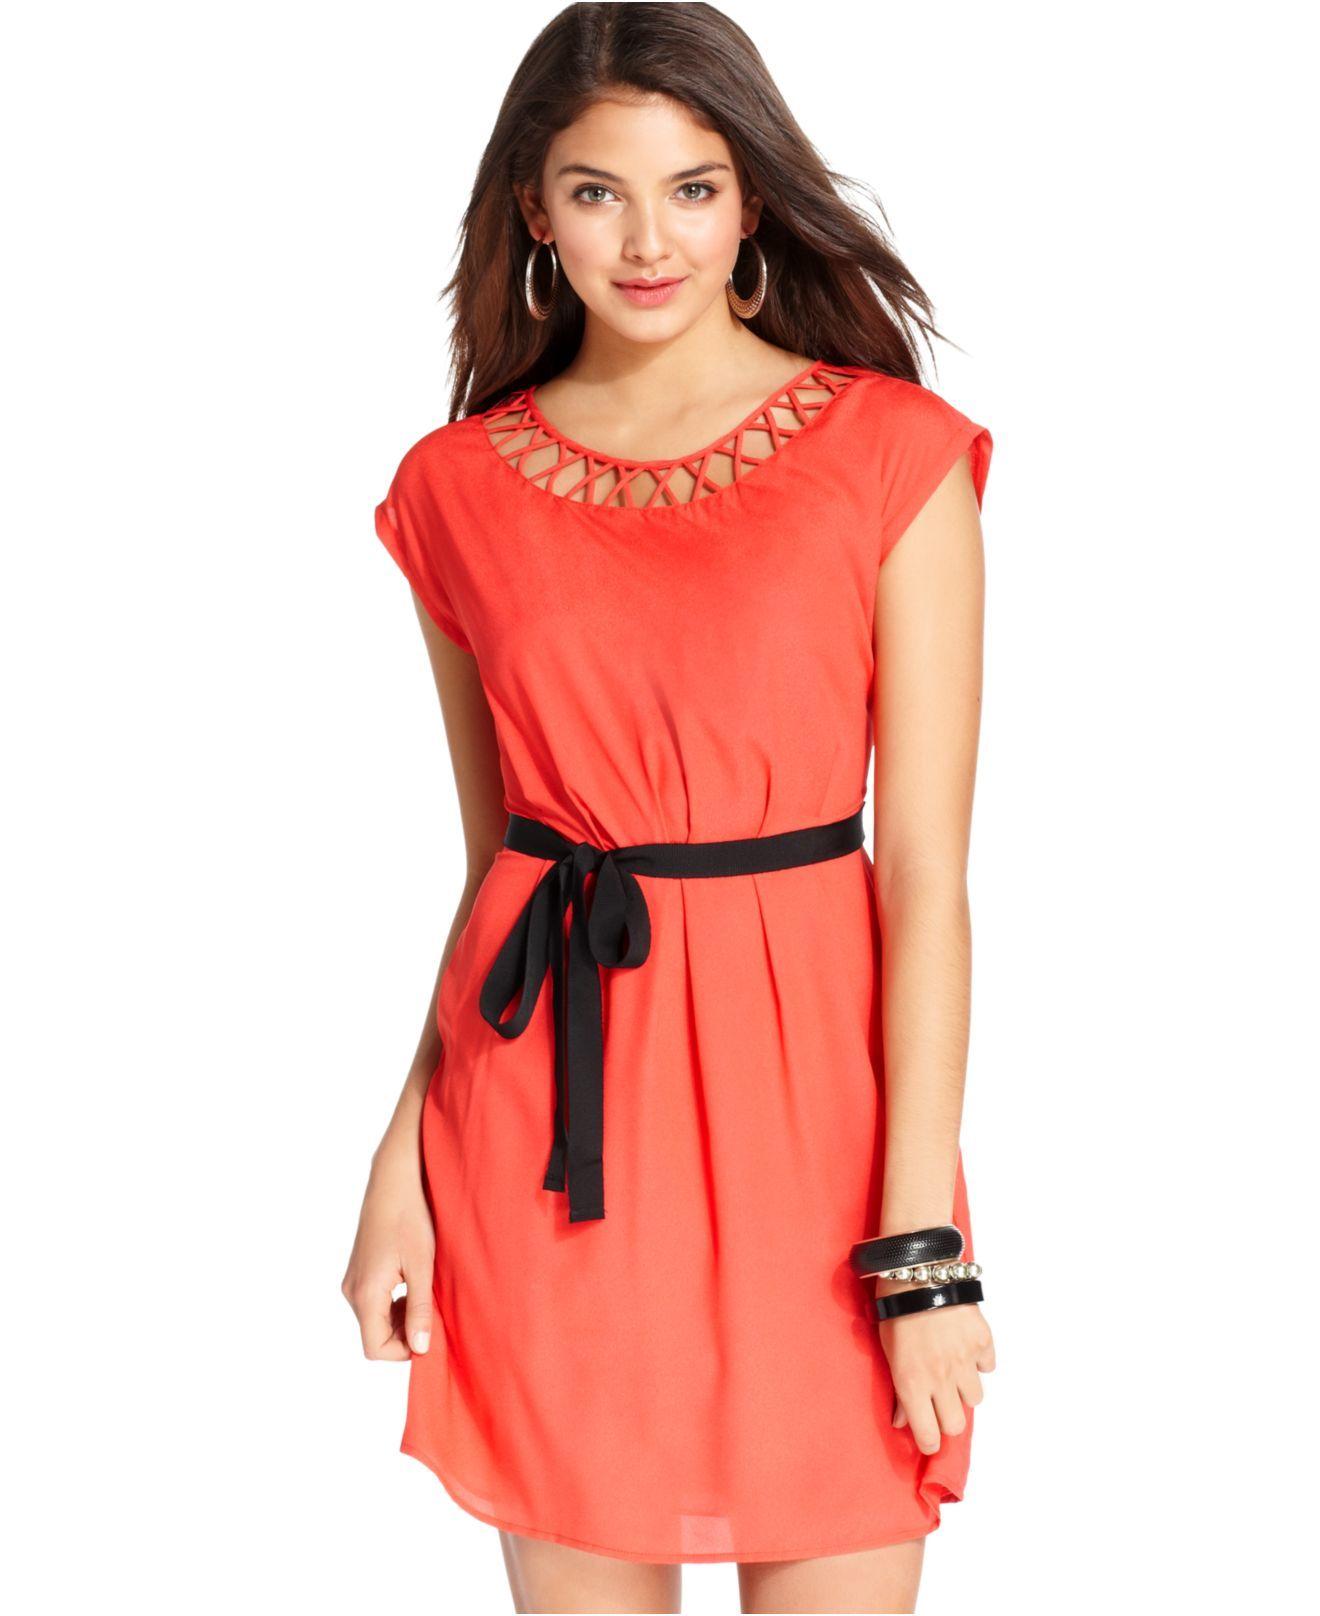 BeBop Juniors Dress, Cap Sleeve Belted Cutout & Reviews